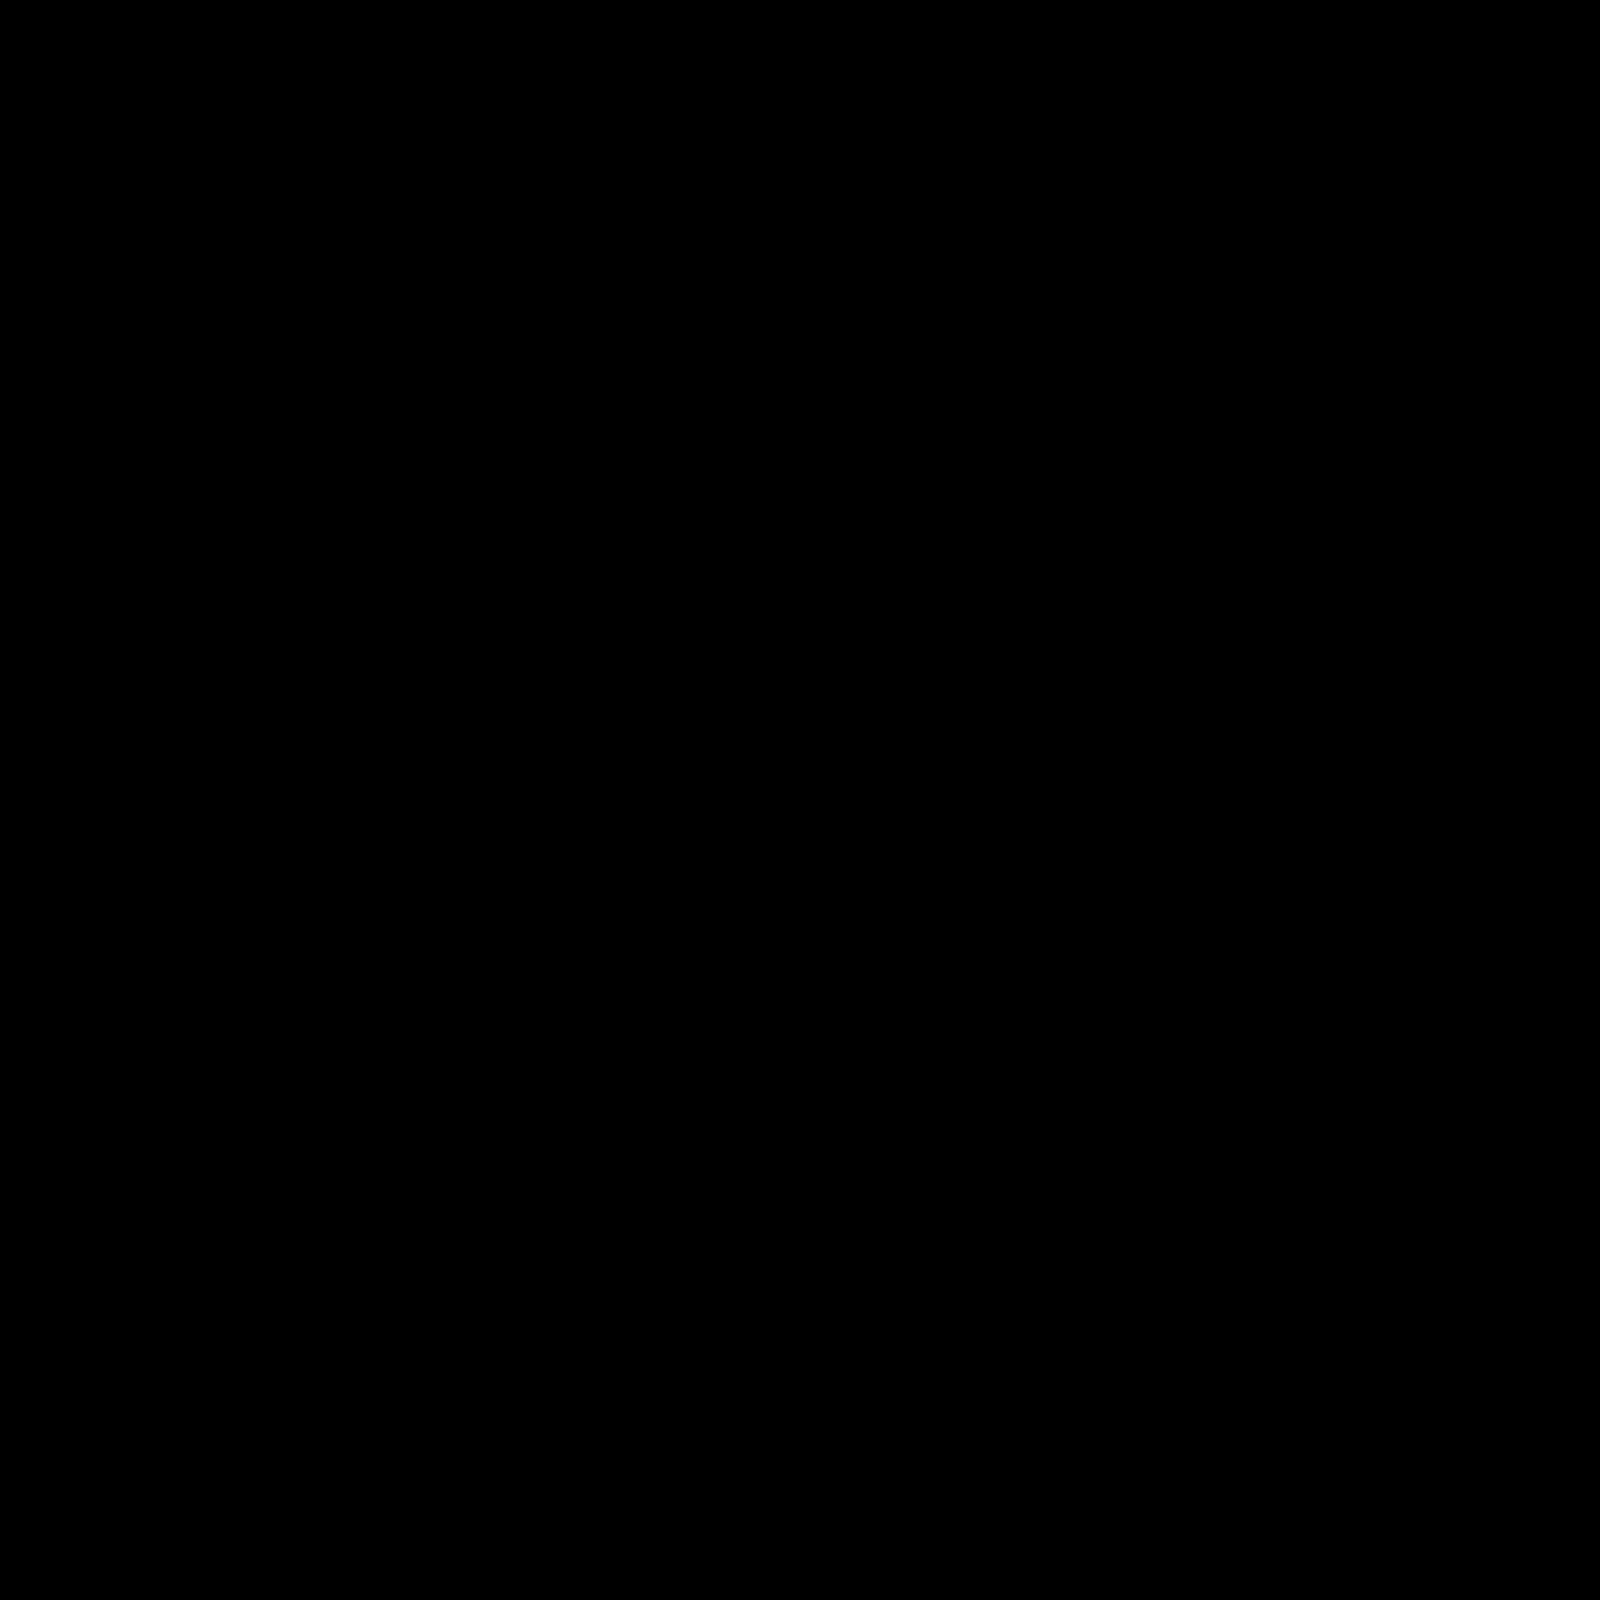 Cylon Head icon